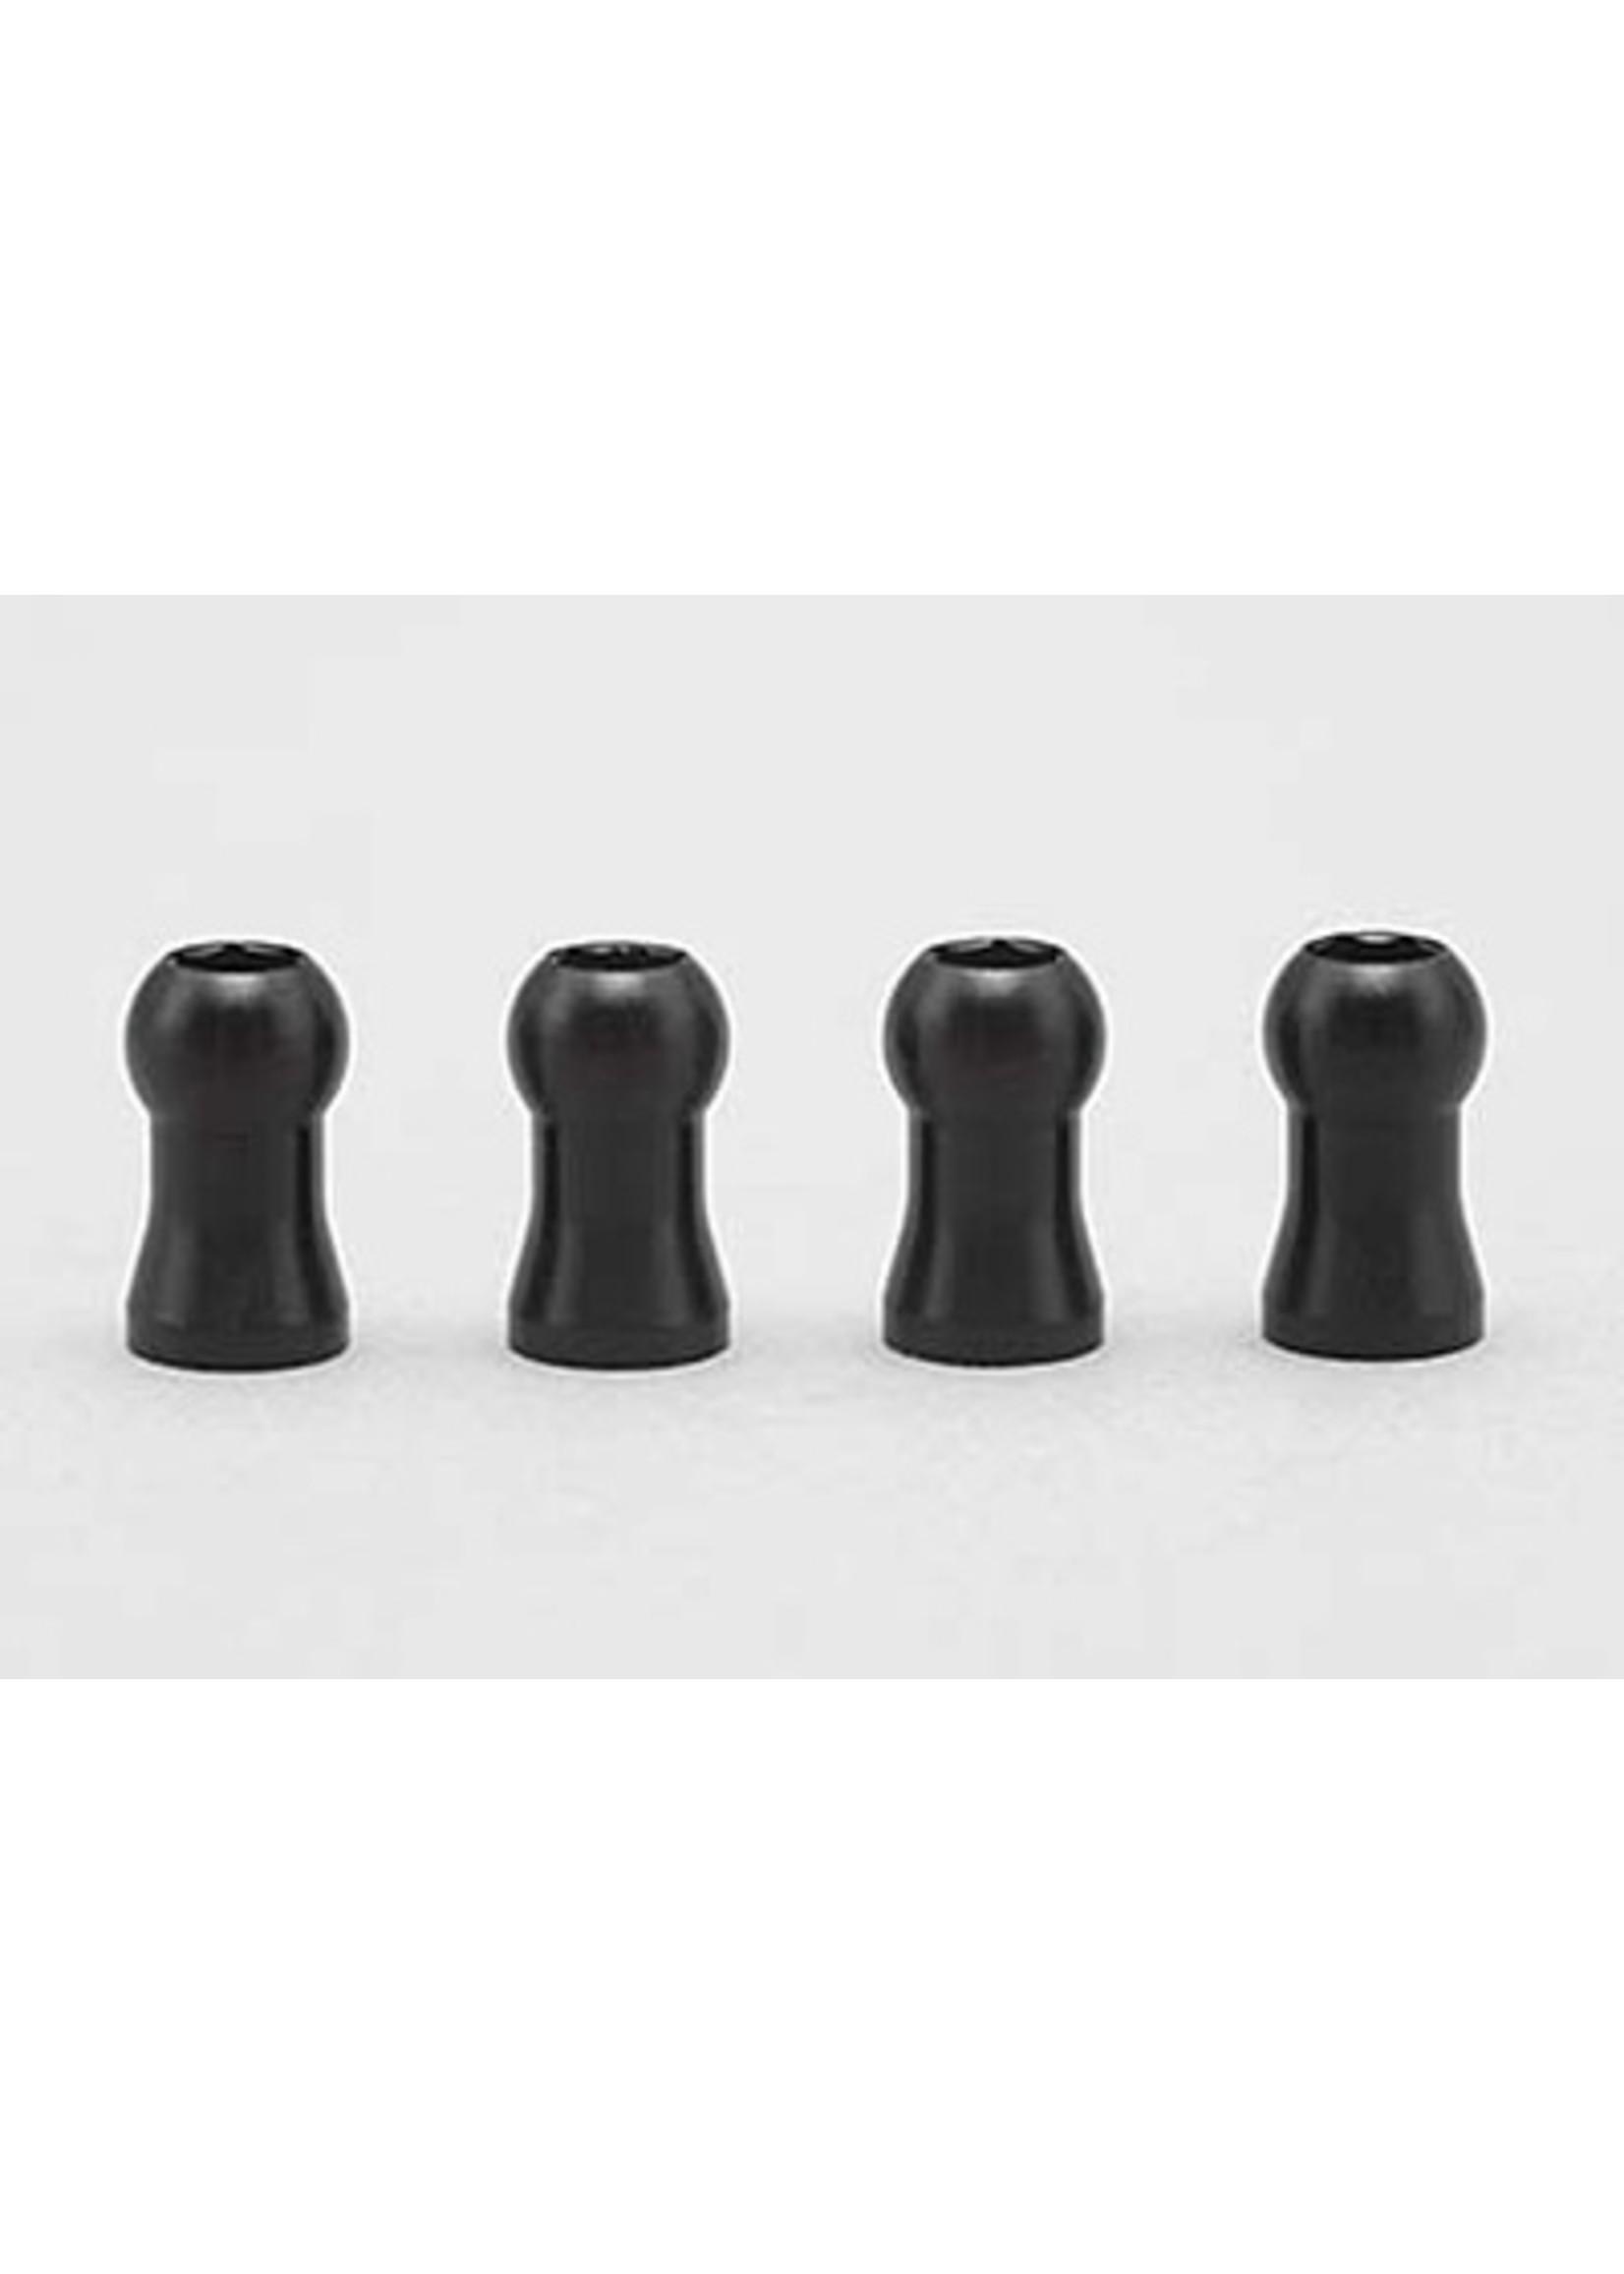 Yokomo YD-4 Shock Cap Nall for SLF Bigbore Shock Y4-S8